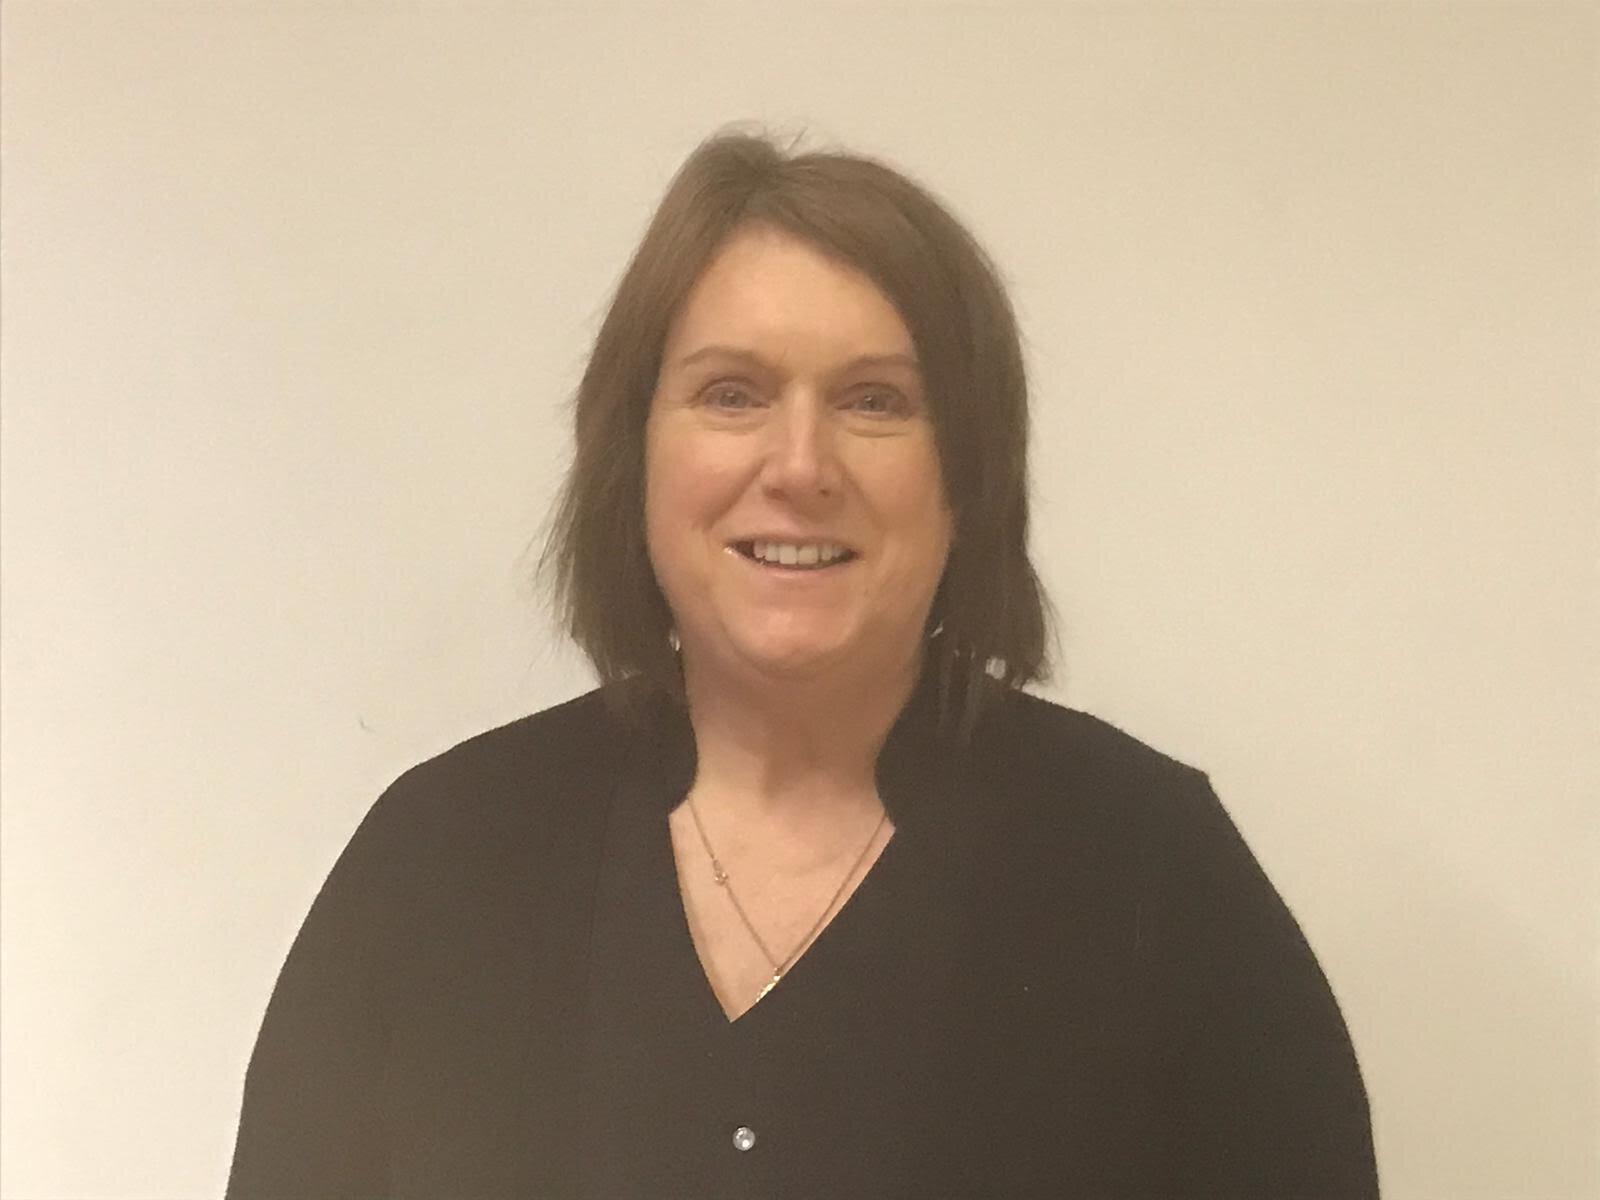 Sandie Thomas - Hollistic Massage Therapist